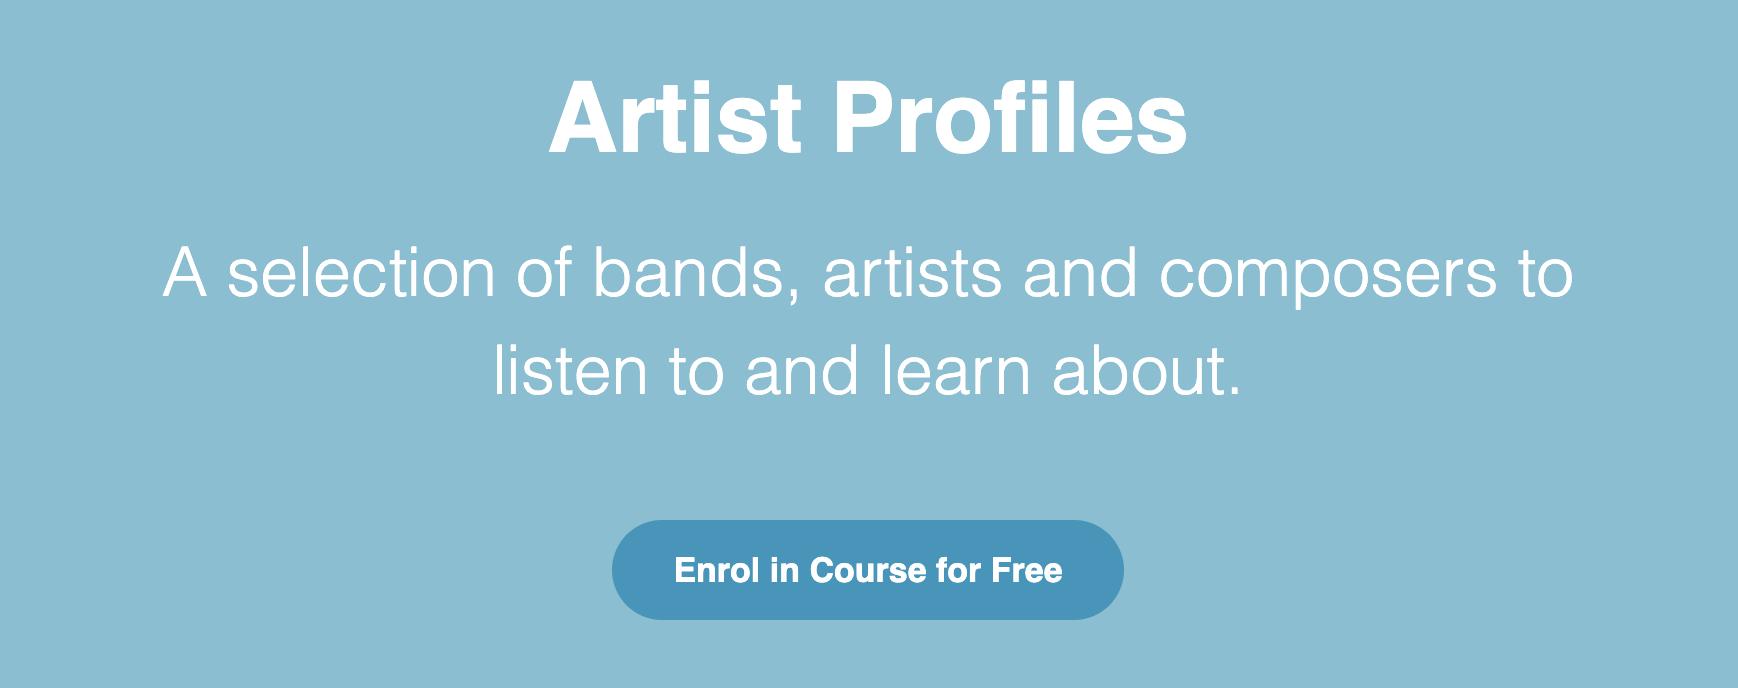 DabbledooMusic Artist Profiles